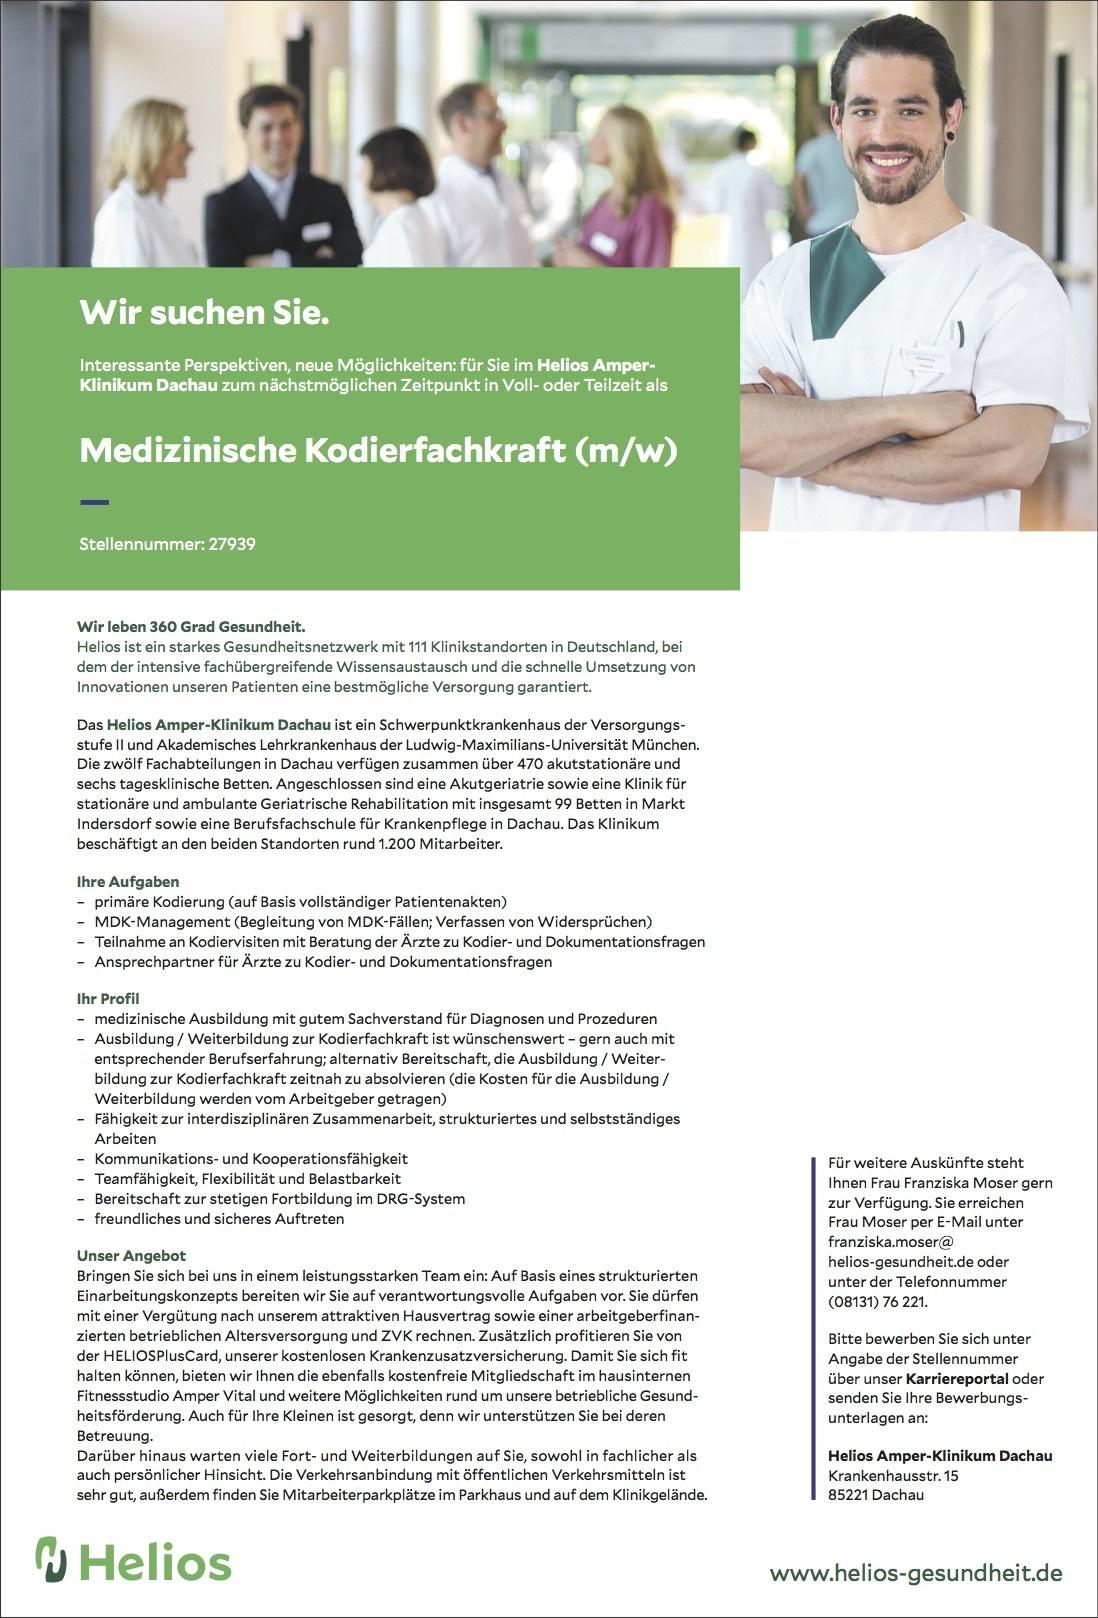 Medizinische Kodierfachkraft (m/w)